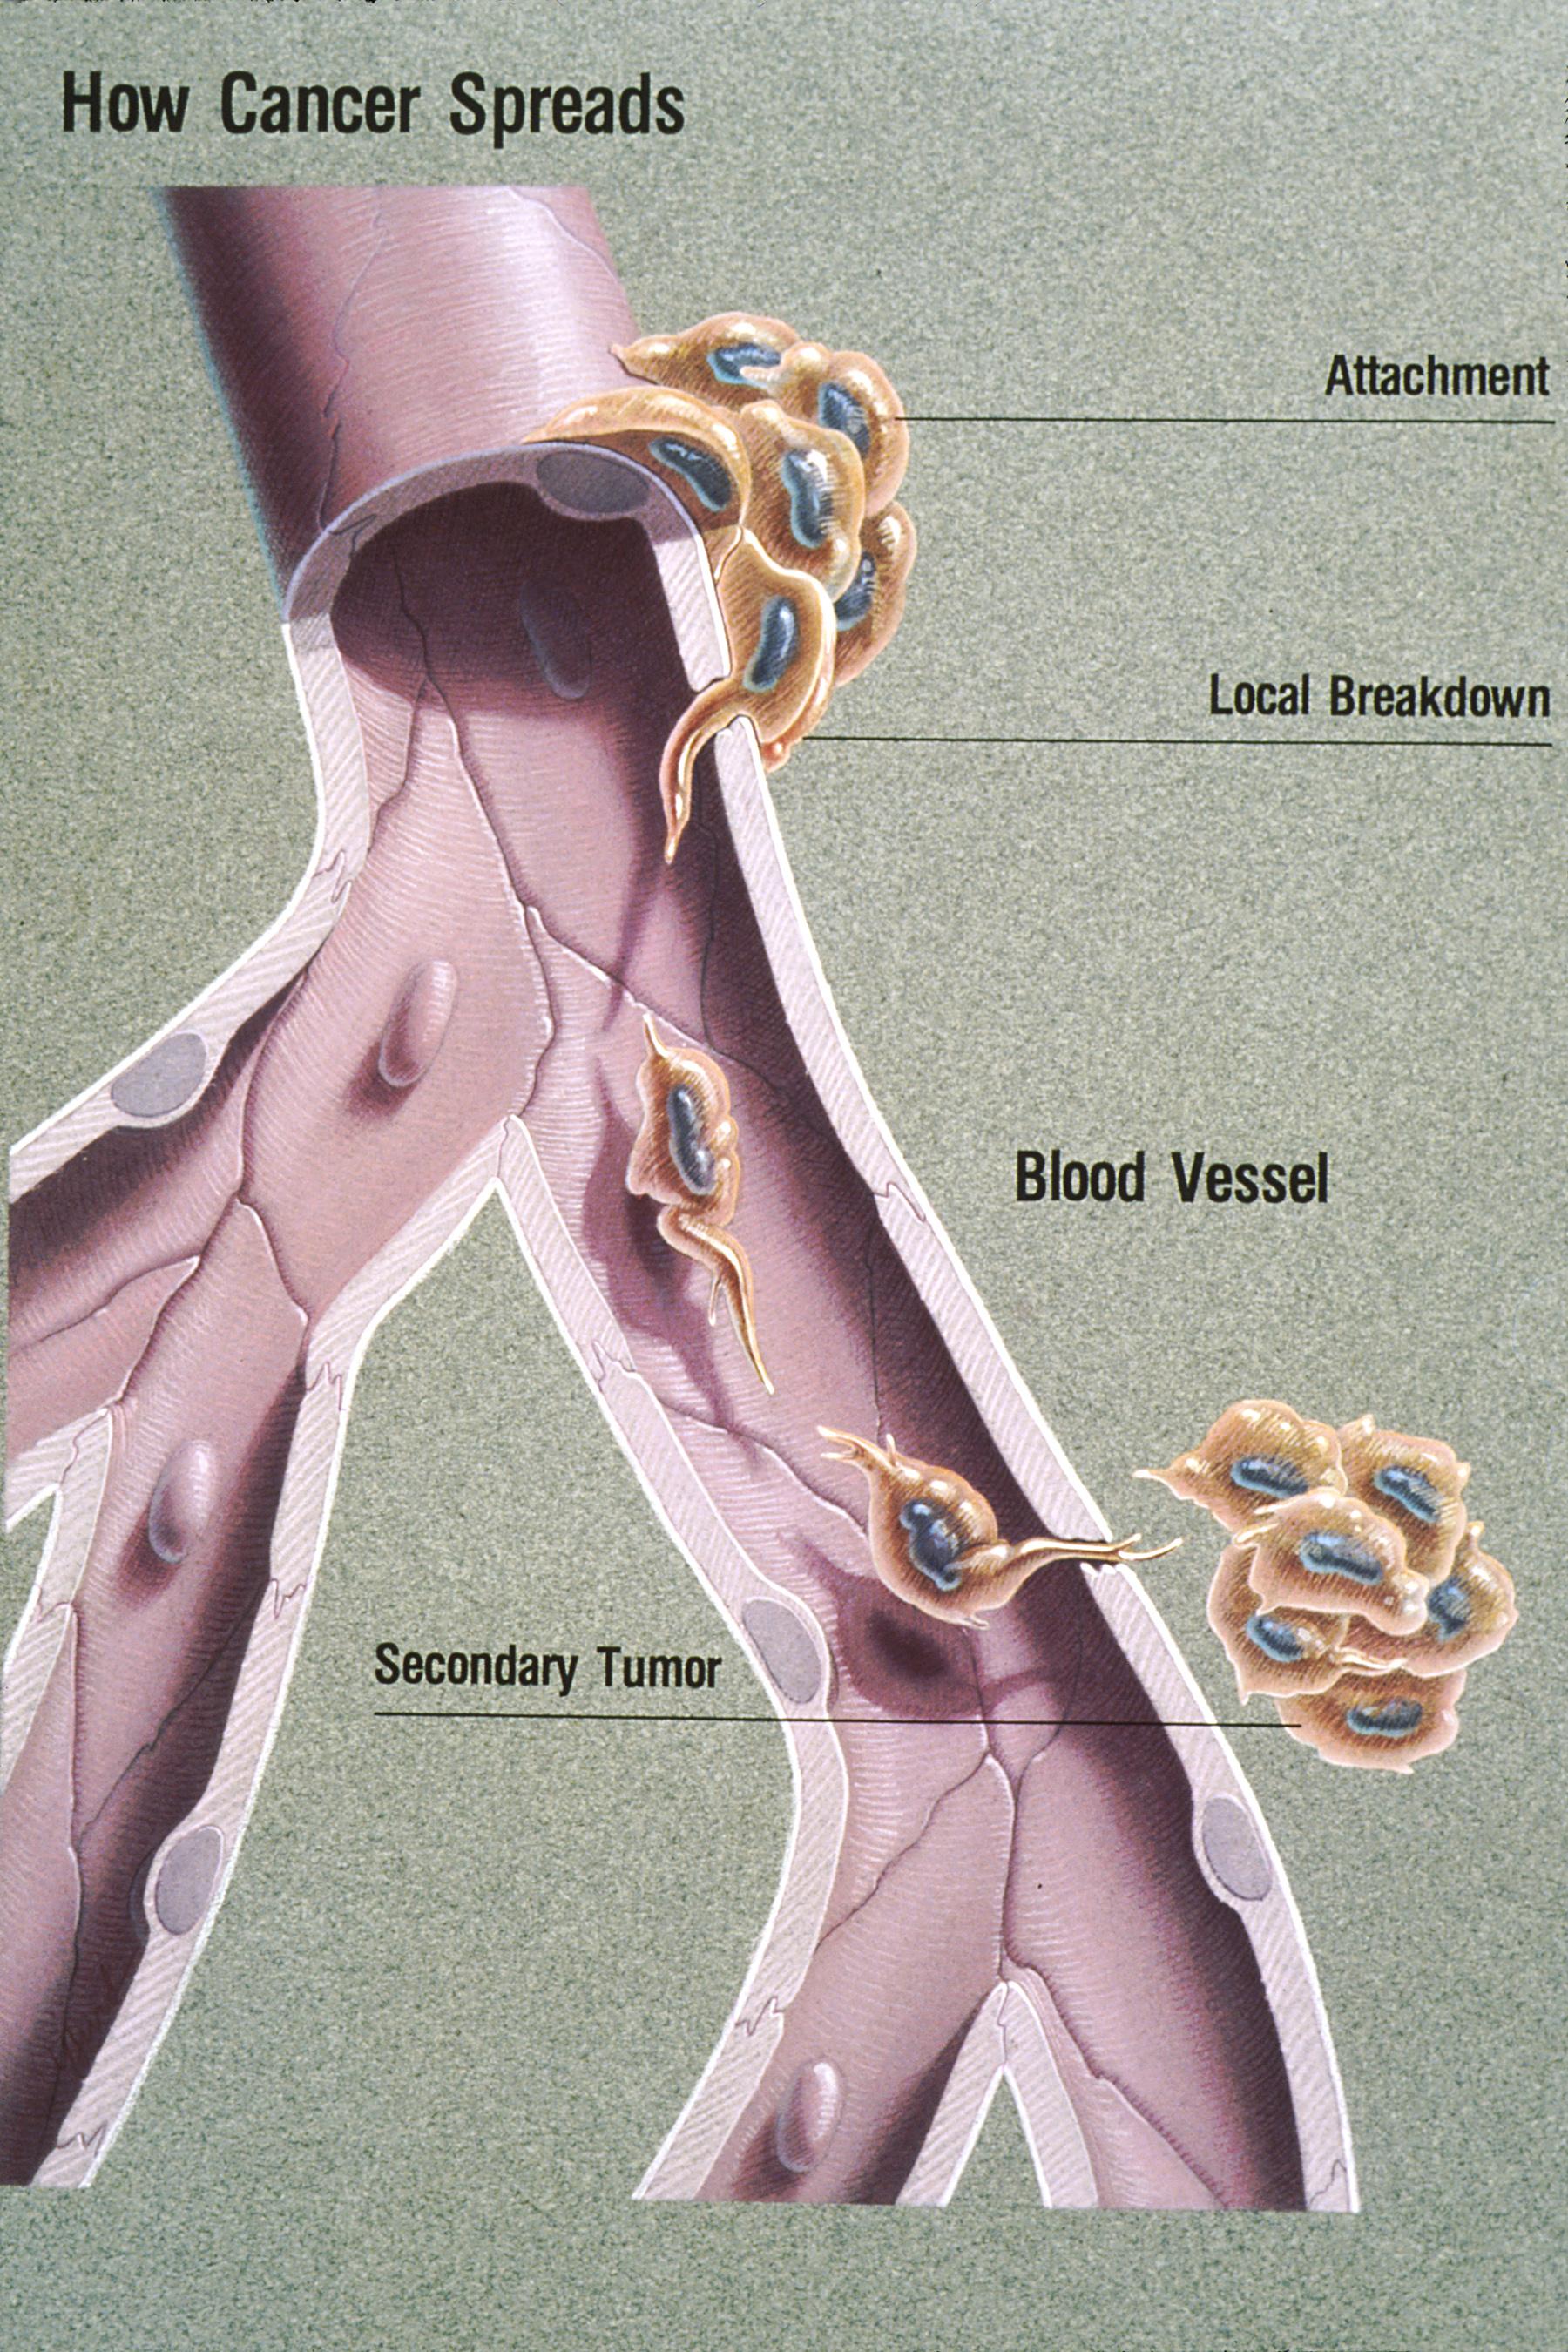 cancer cellule maligne cancer de pancreas estadio 4